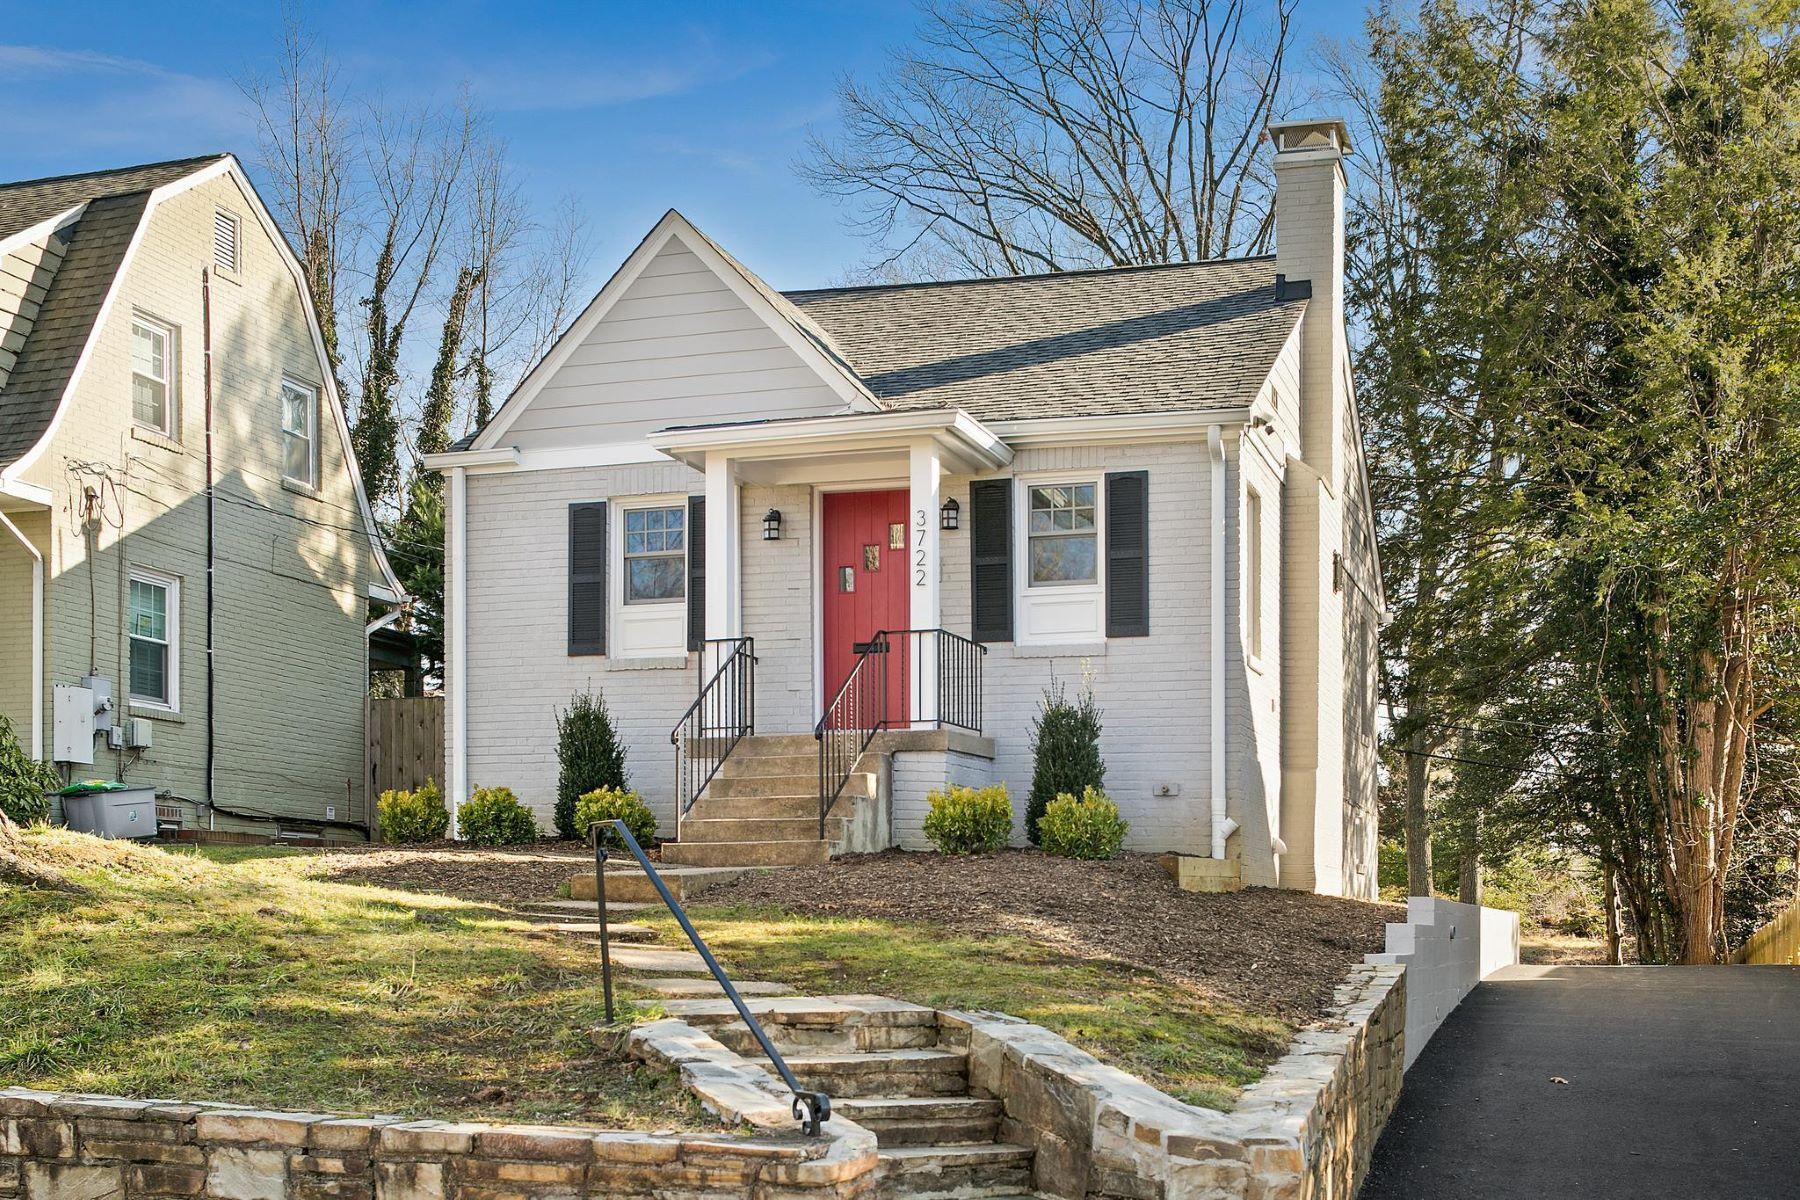 Single Family Homes for Active at 3722 N Pershing Dr Arlington, Virginia 22203 United States